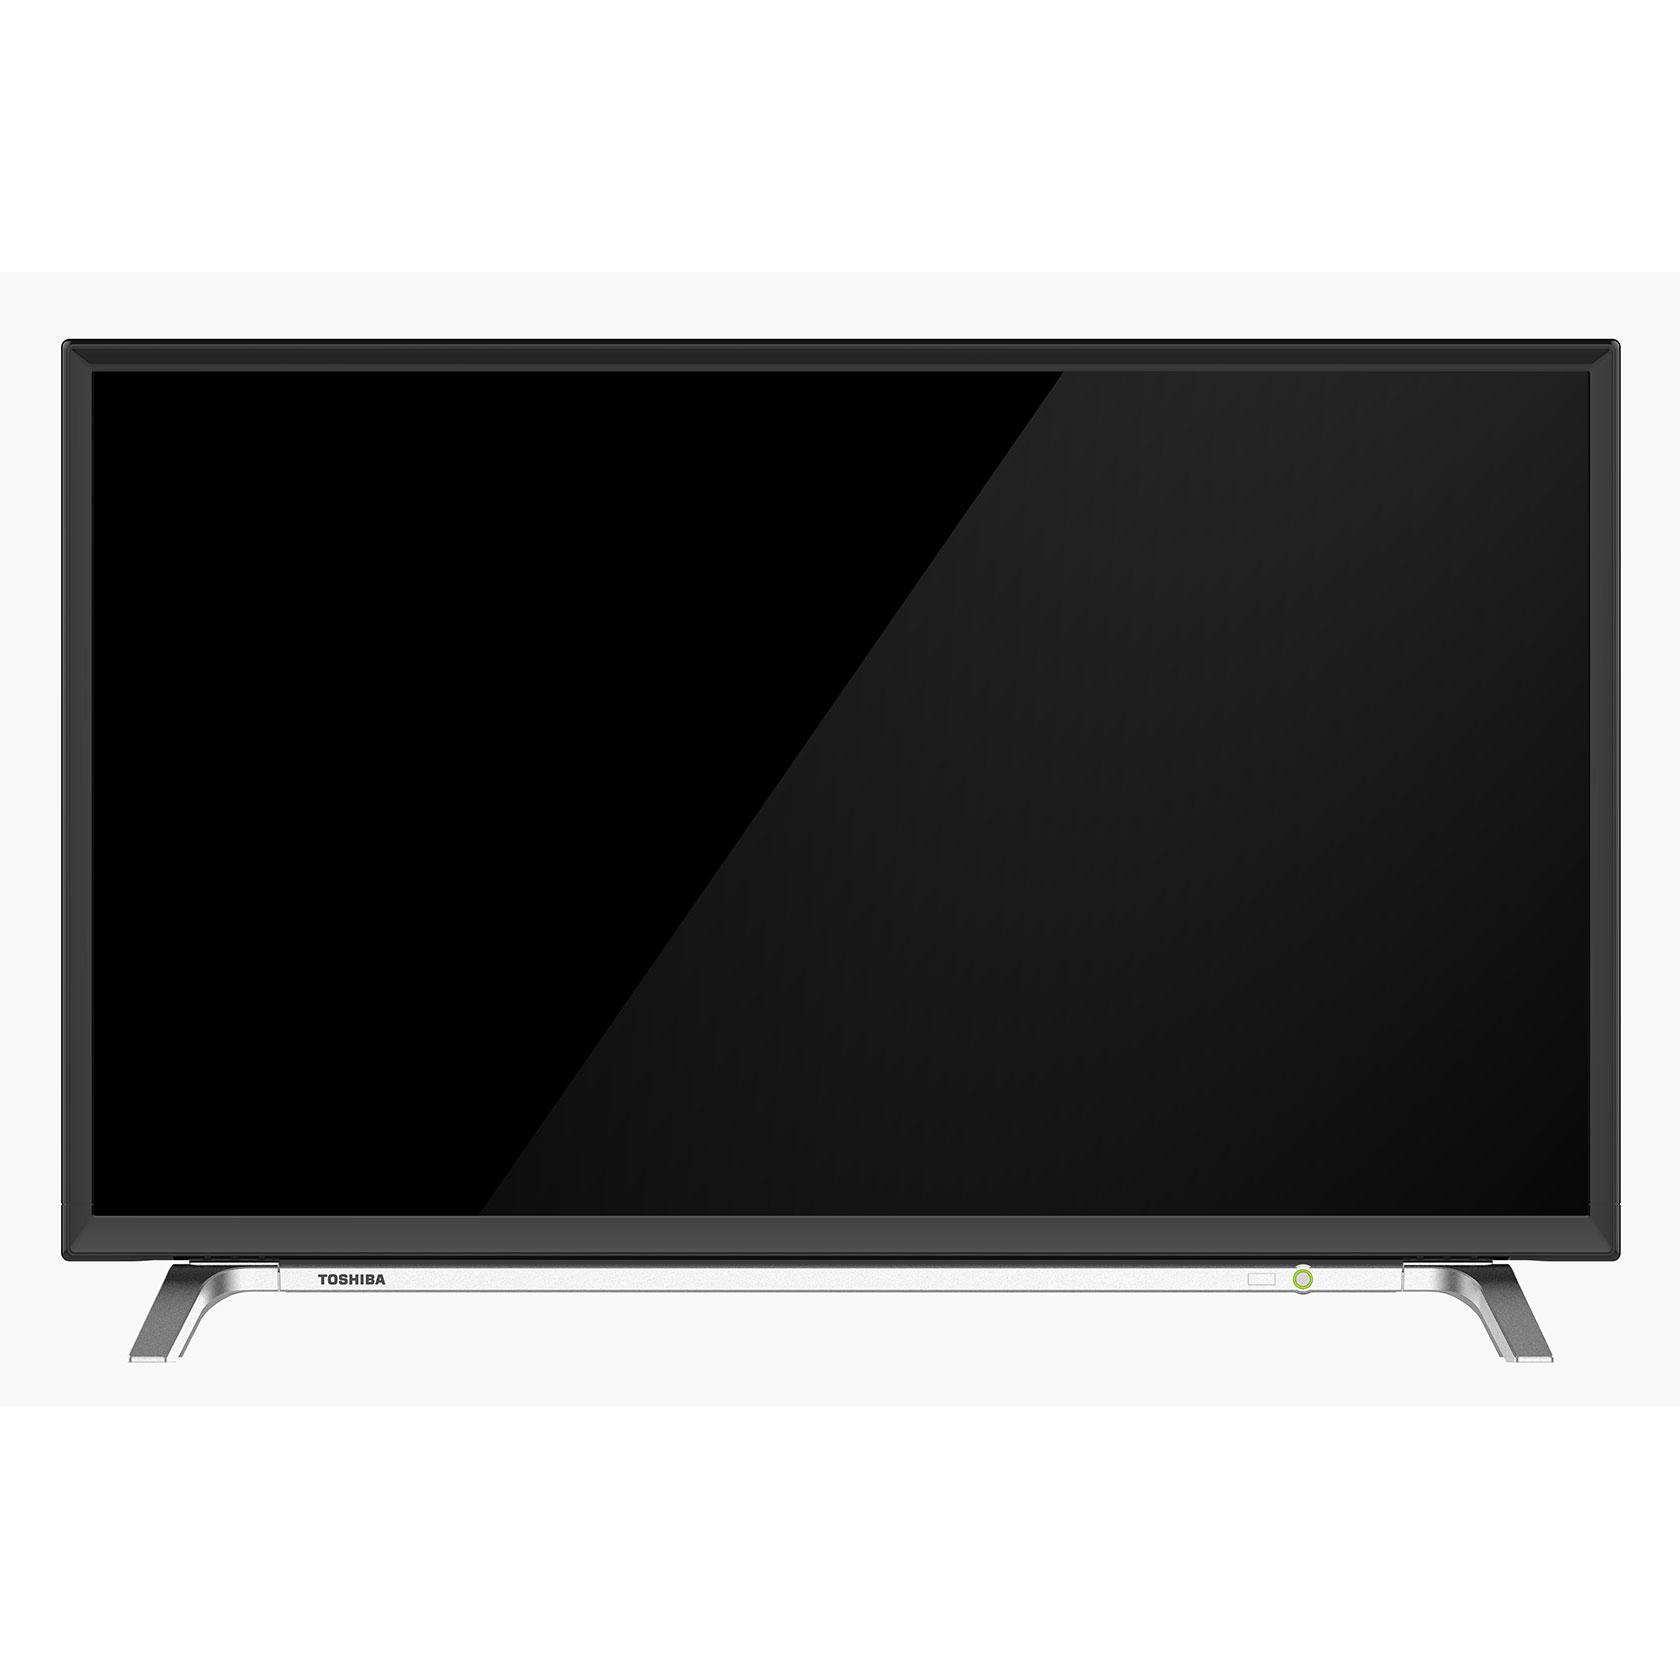 "Toshiba Smart Digital TV 49"" รุ่น 49L5650VT"